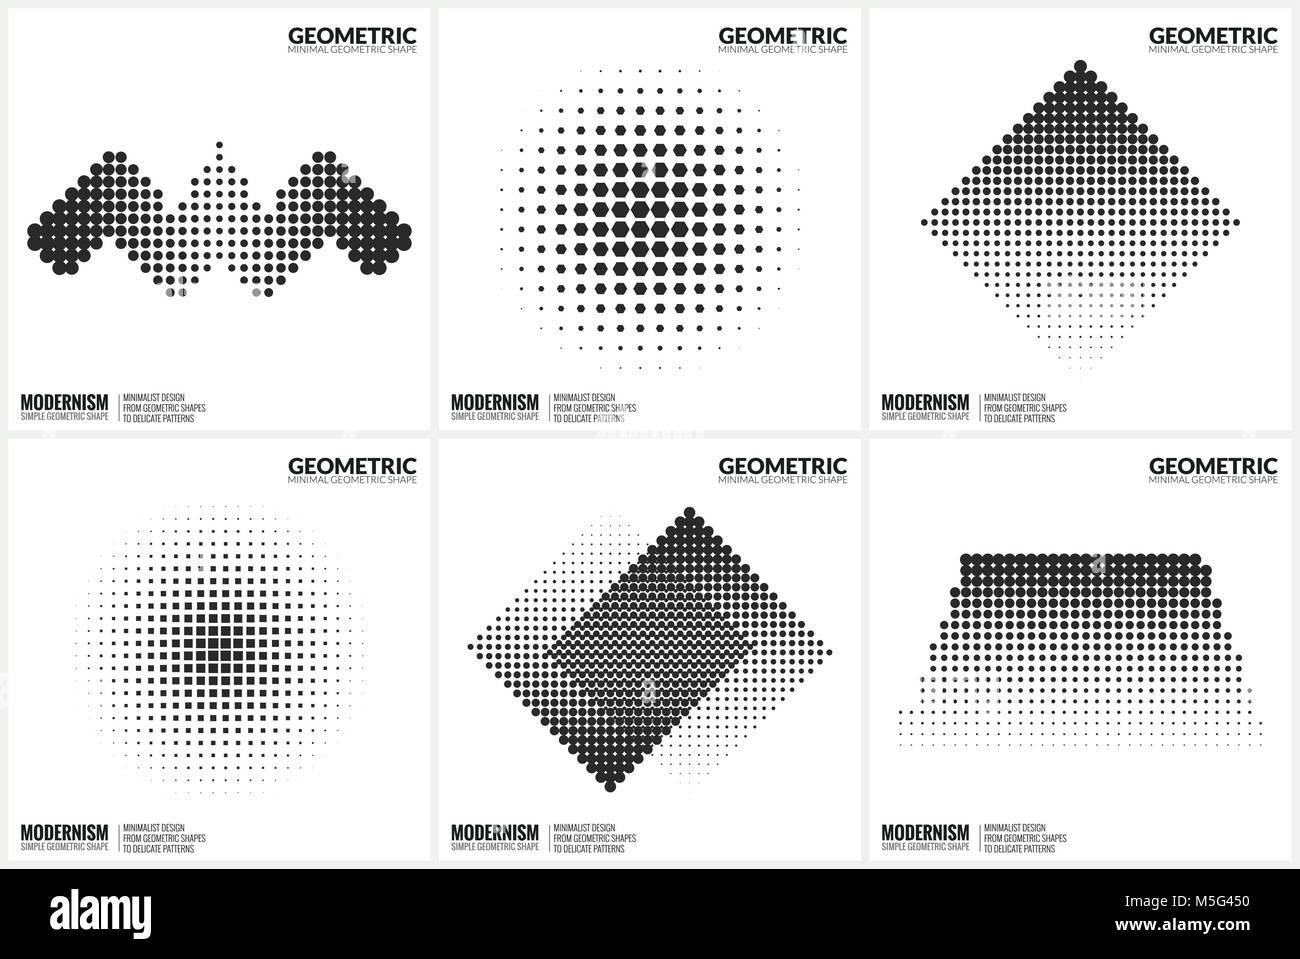 Universal Halftone Geometric Shapes For Design  - Stock Image